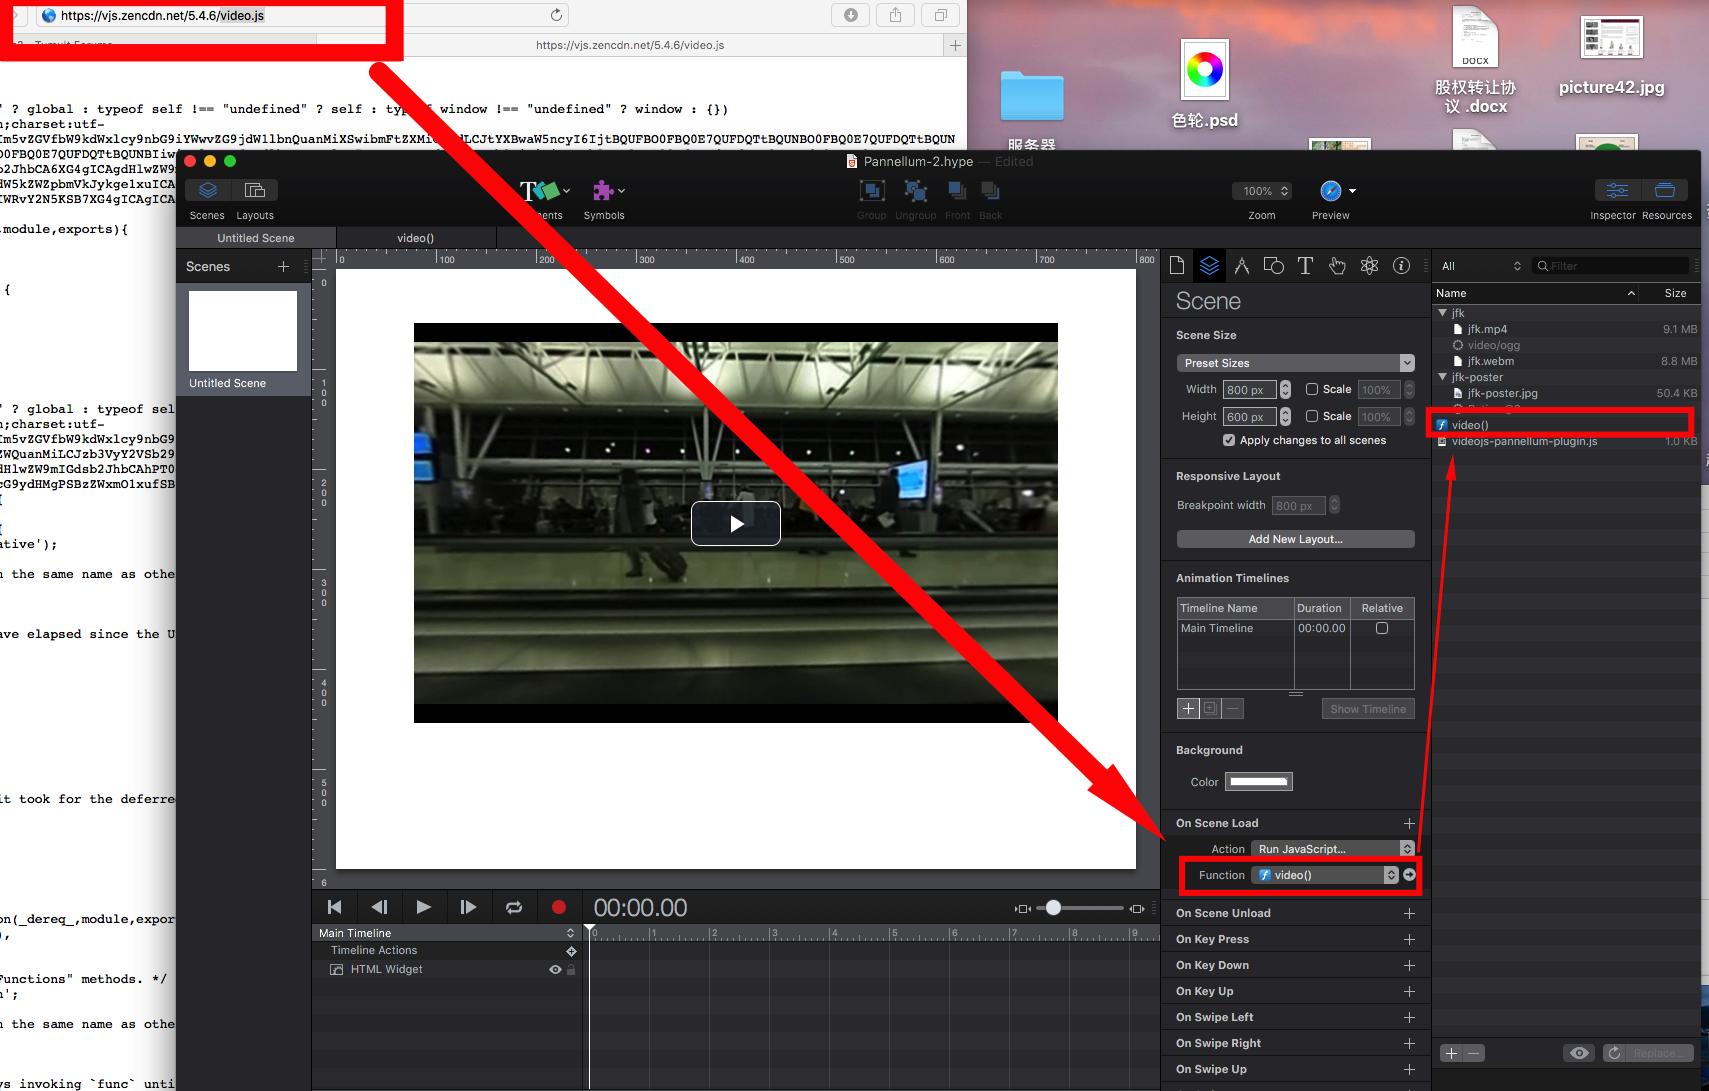 360 degree video - video js? - video - Tumult Forums